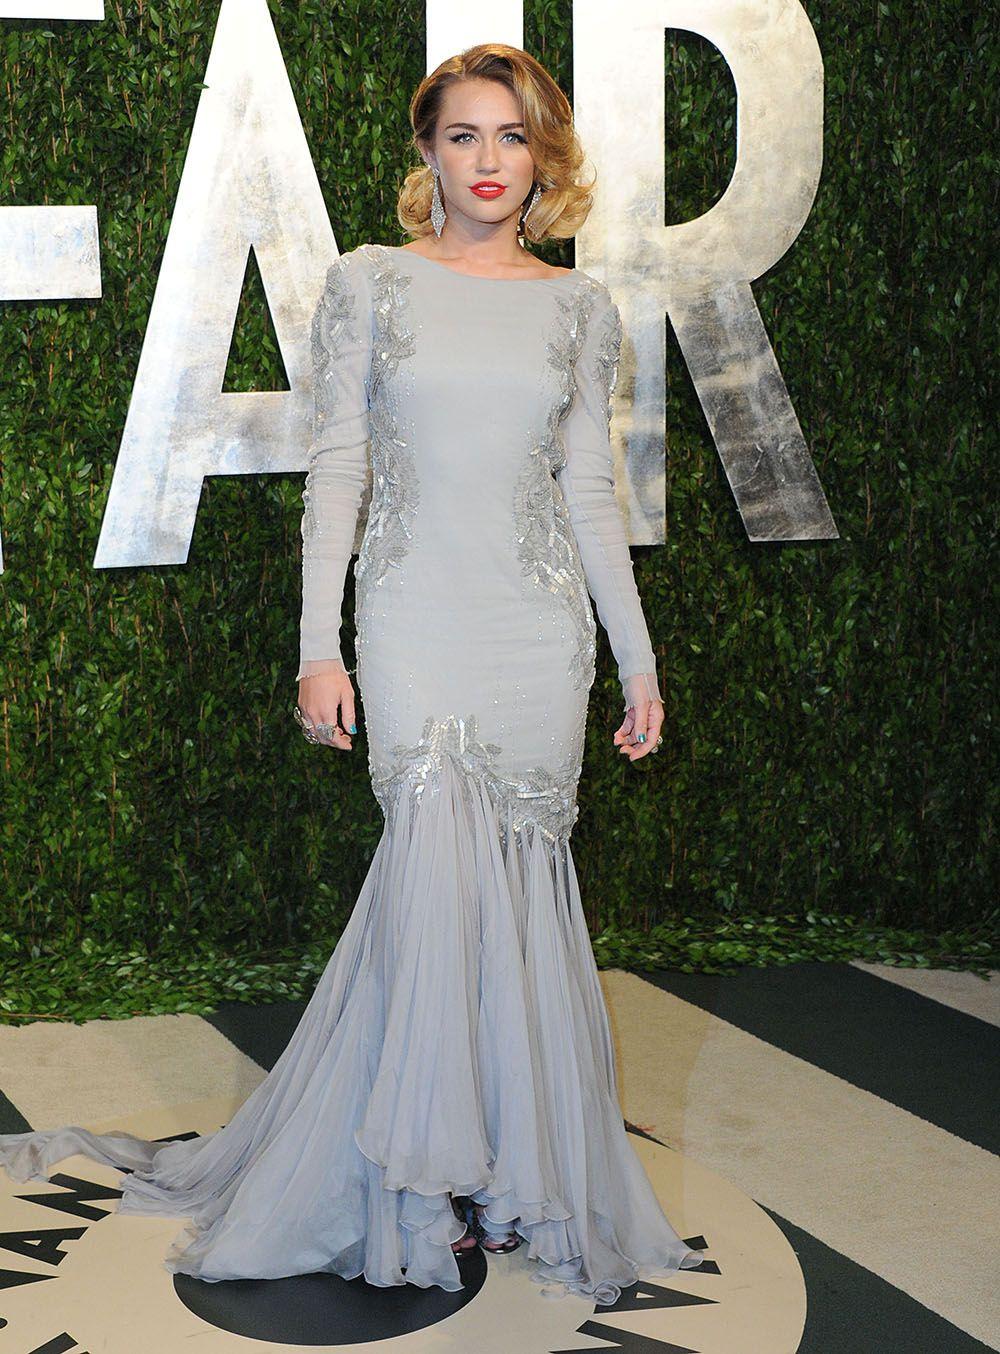 50 Shades of Grey (dresses) Scarlett Johansson in a grey dress